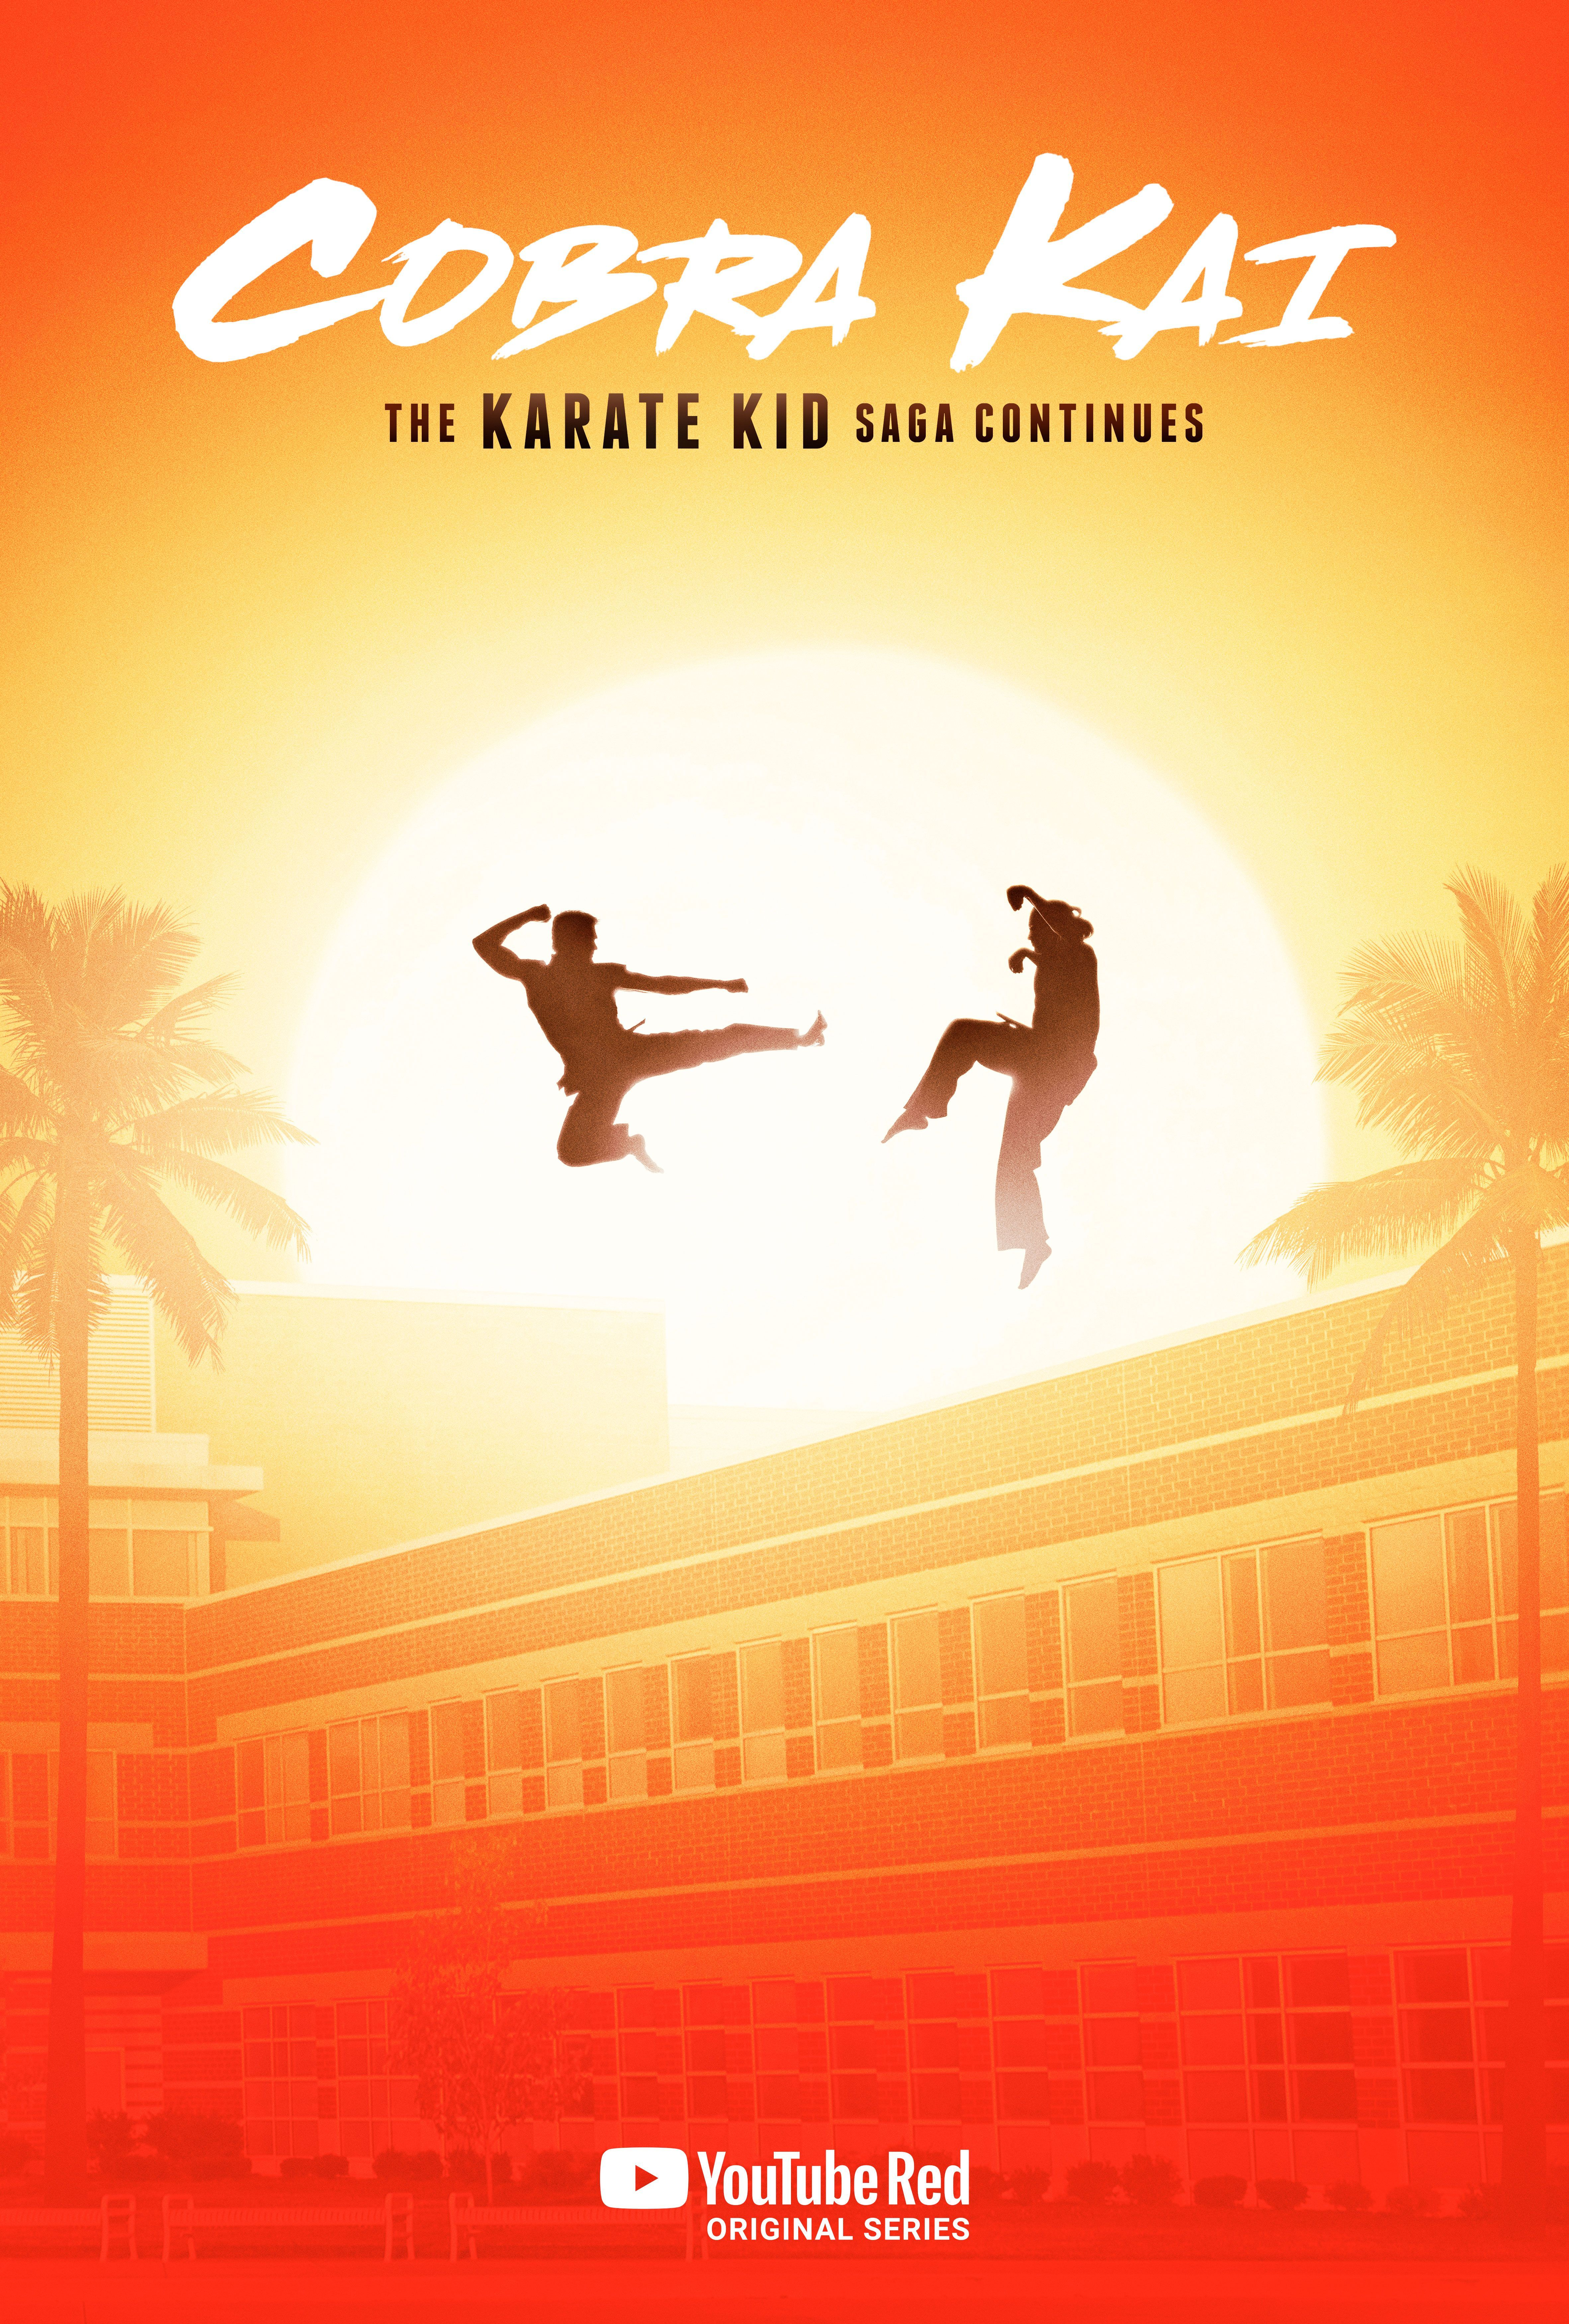 Cobra Kai Wallpapers  Karate kid movie Karate 4725x7000